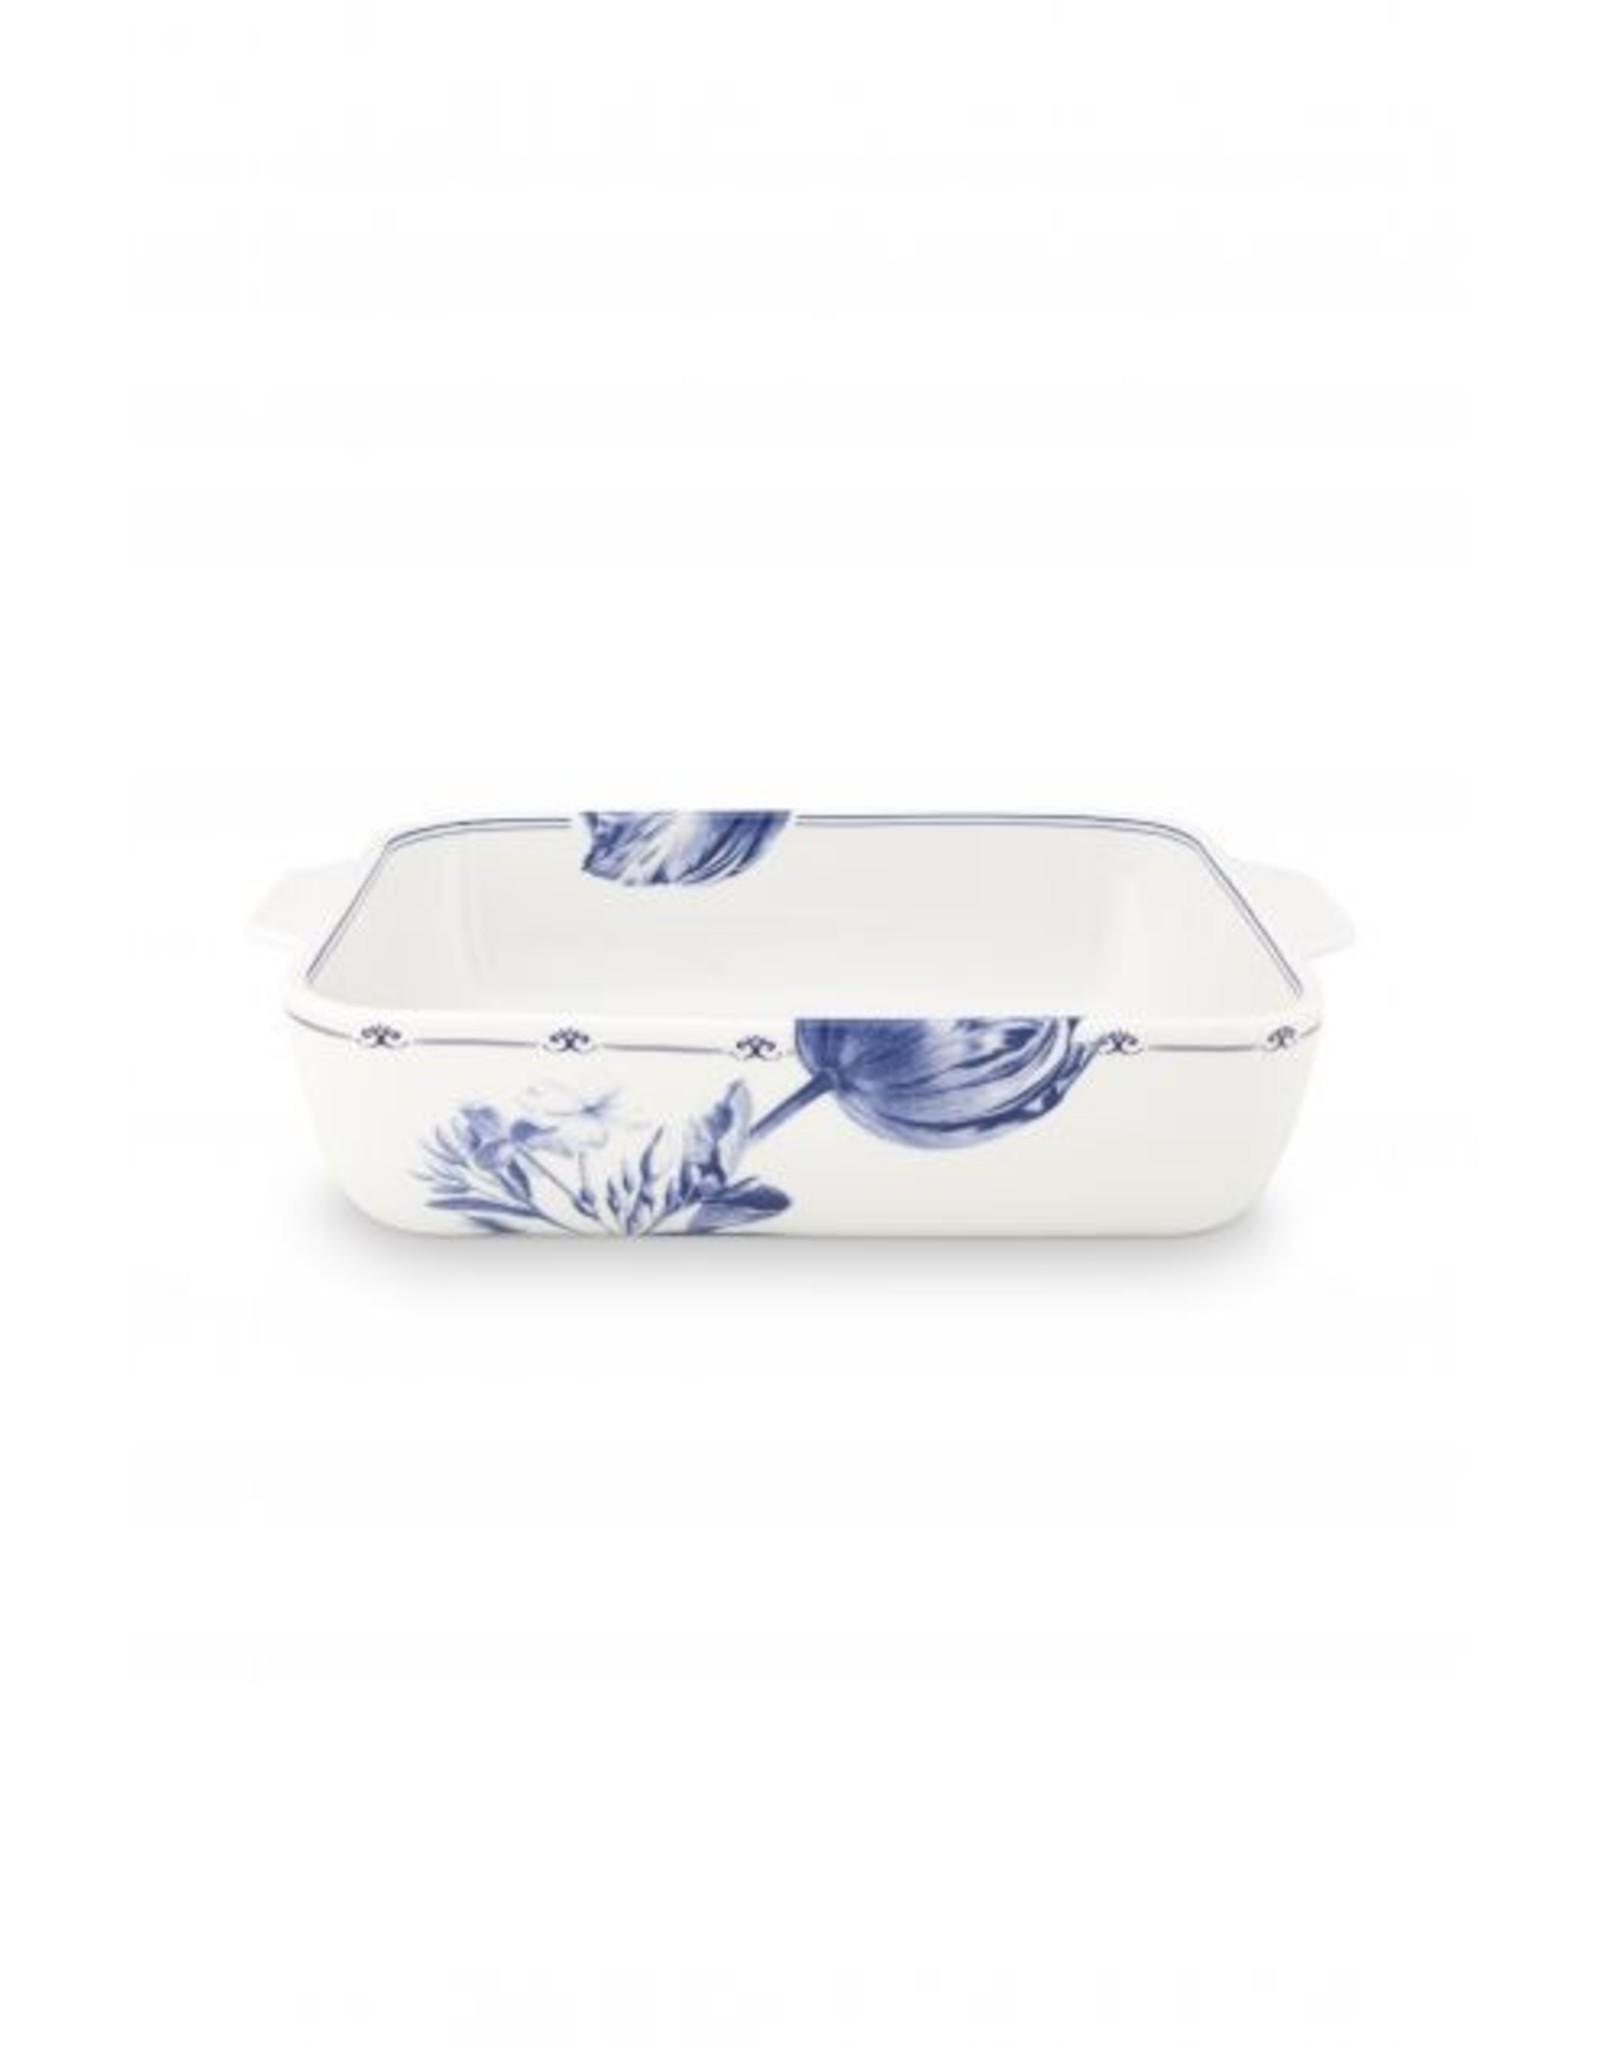 Janny van der Heijden Baking dish rectangular 27.5 x 18